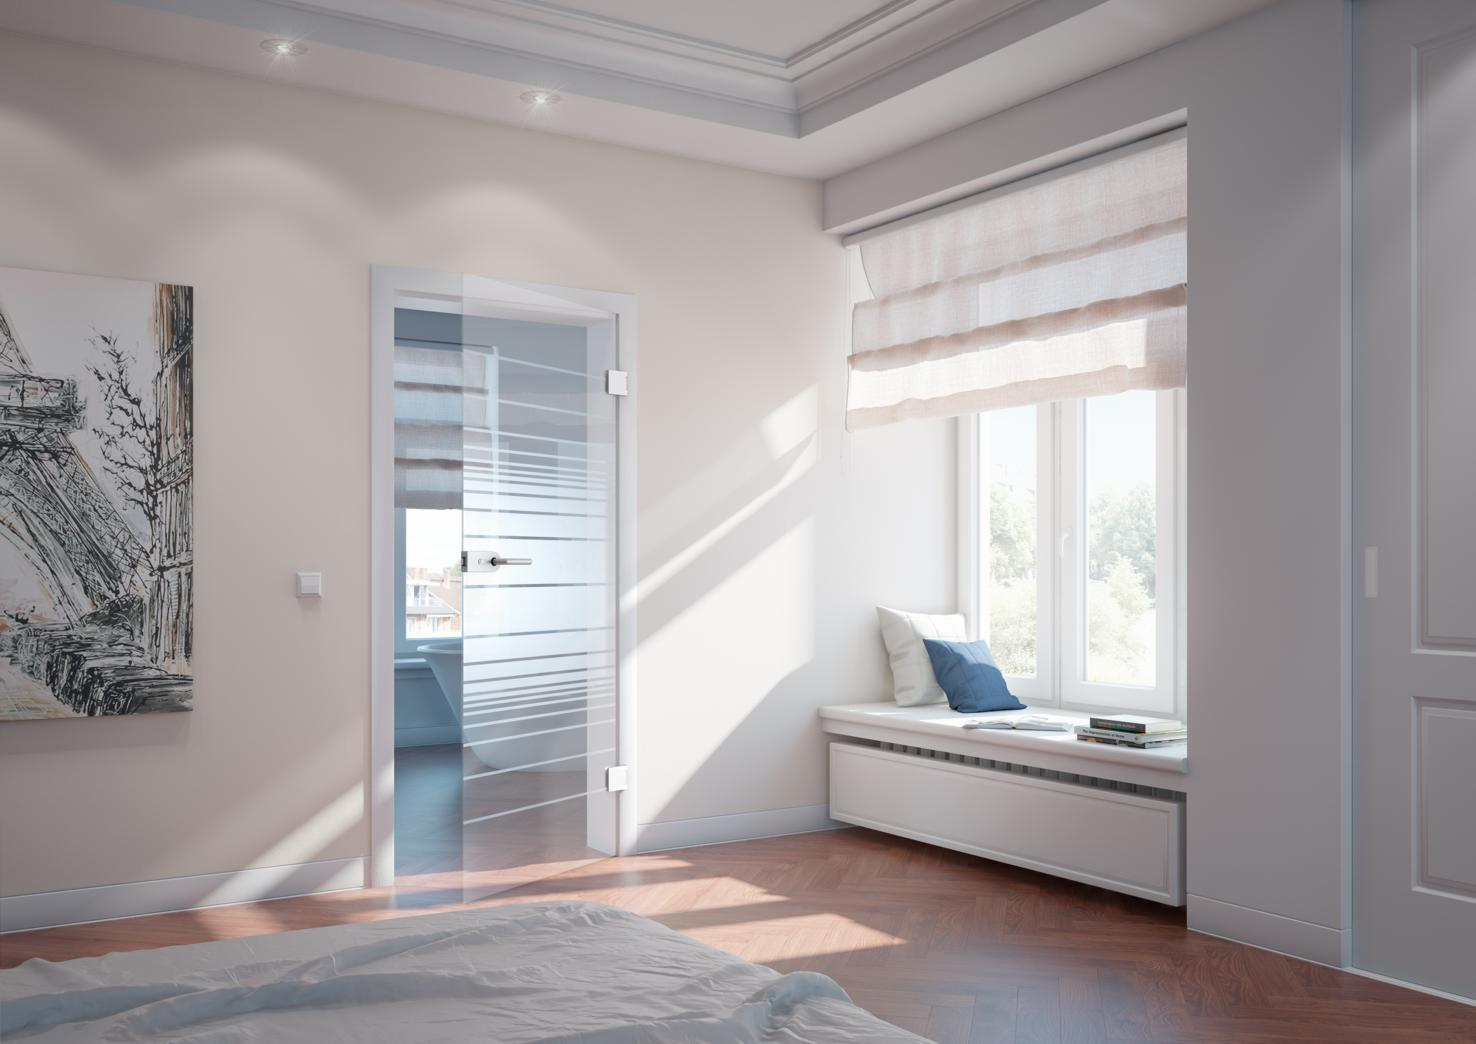 Favorit Glas-Türen, Schiebetüren & Glas-Drehtüren | Holz Ziller DU11